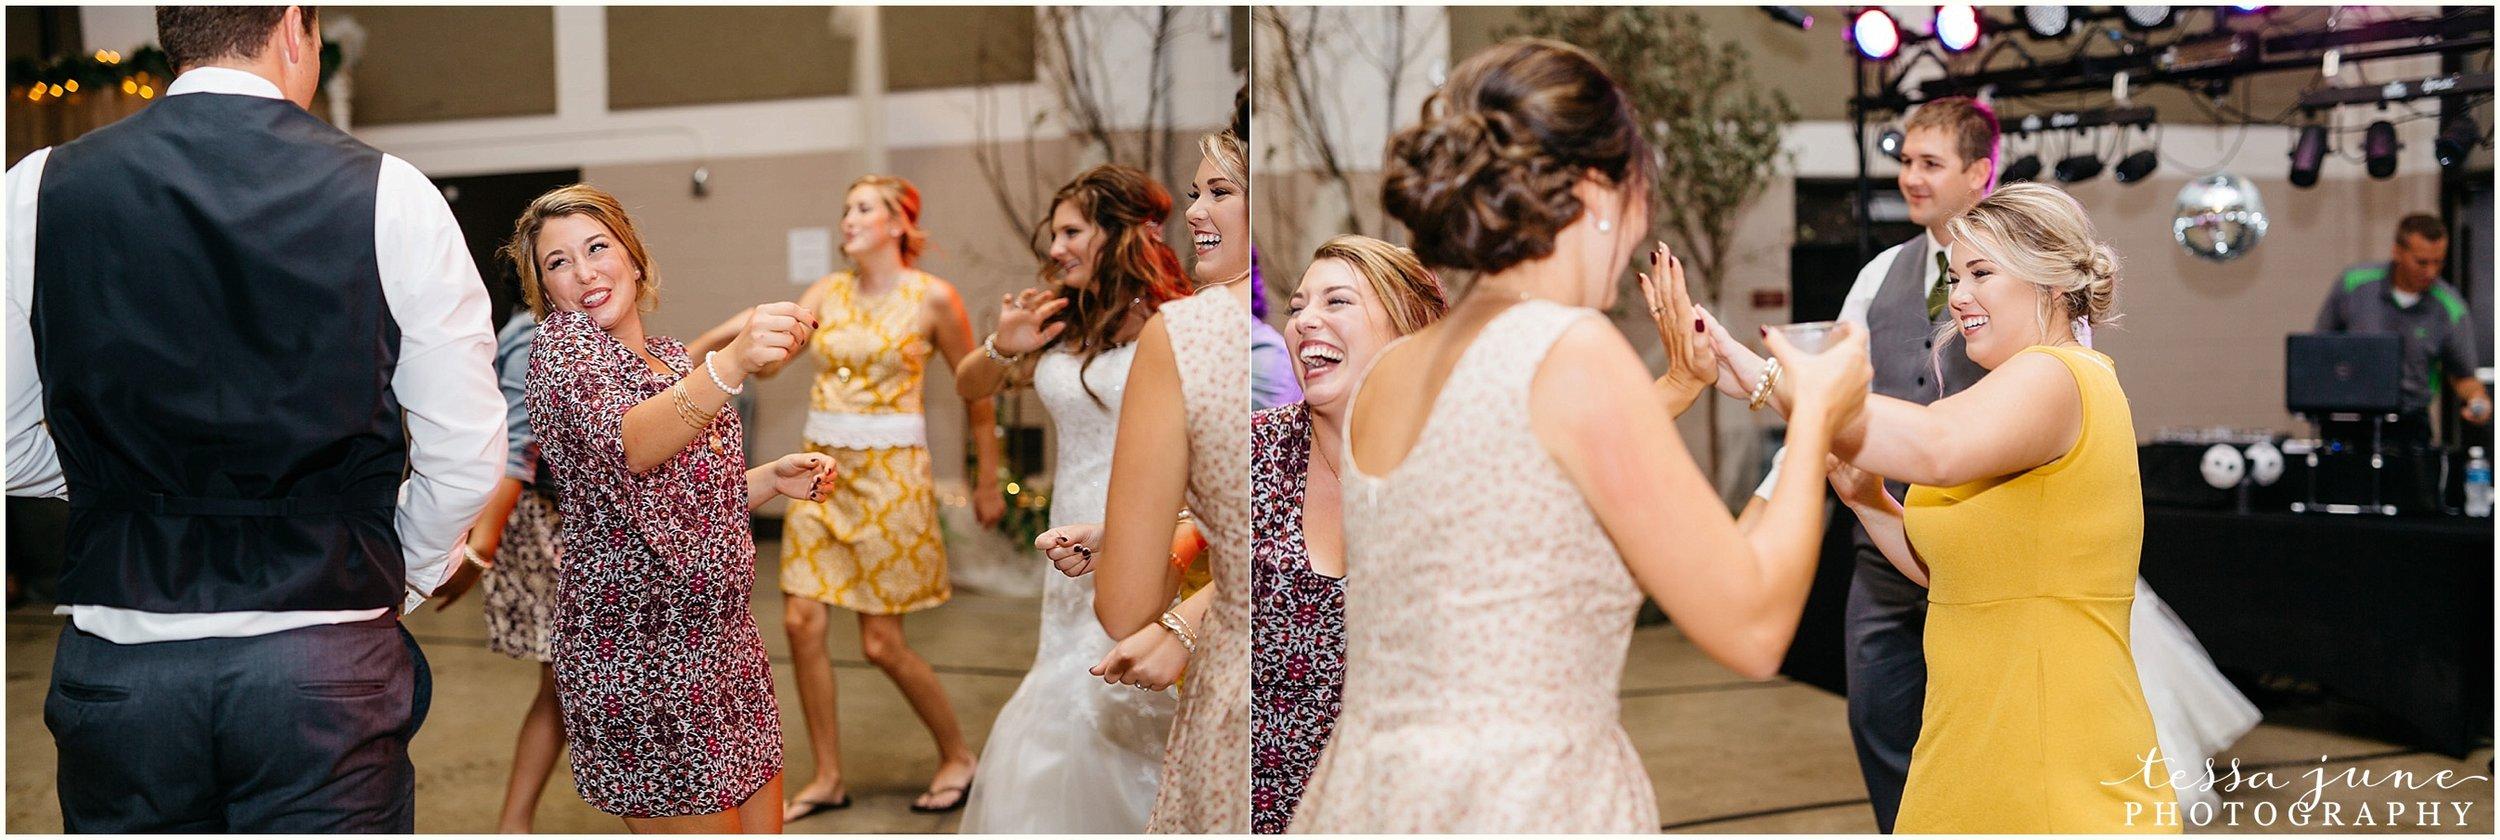 bohemian-minnesota-wedding-mismatched-bridesmaid-dresses-waterfall-st-cloud-tessa-june-photography-201.jpg